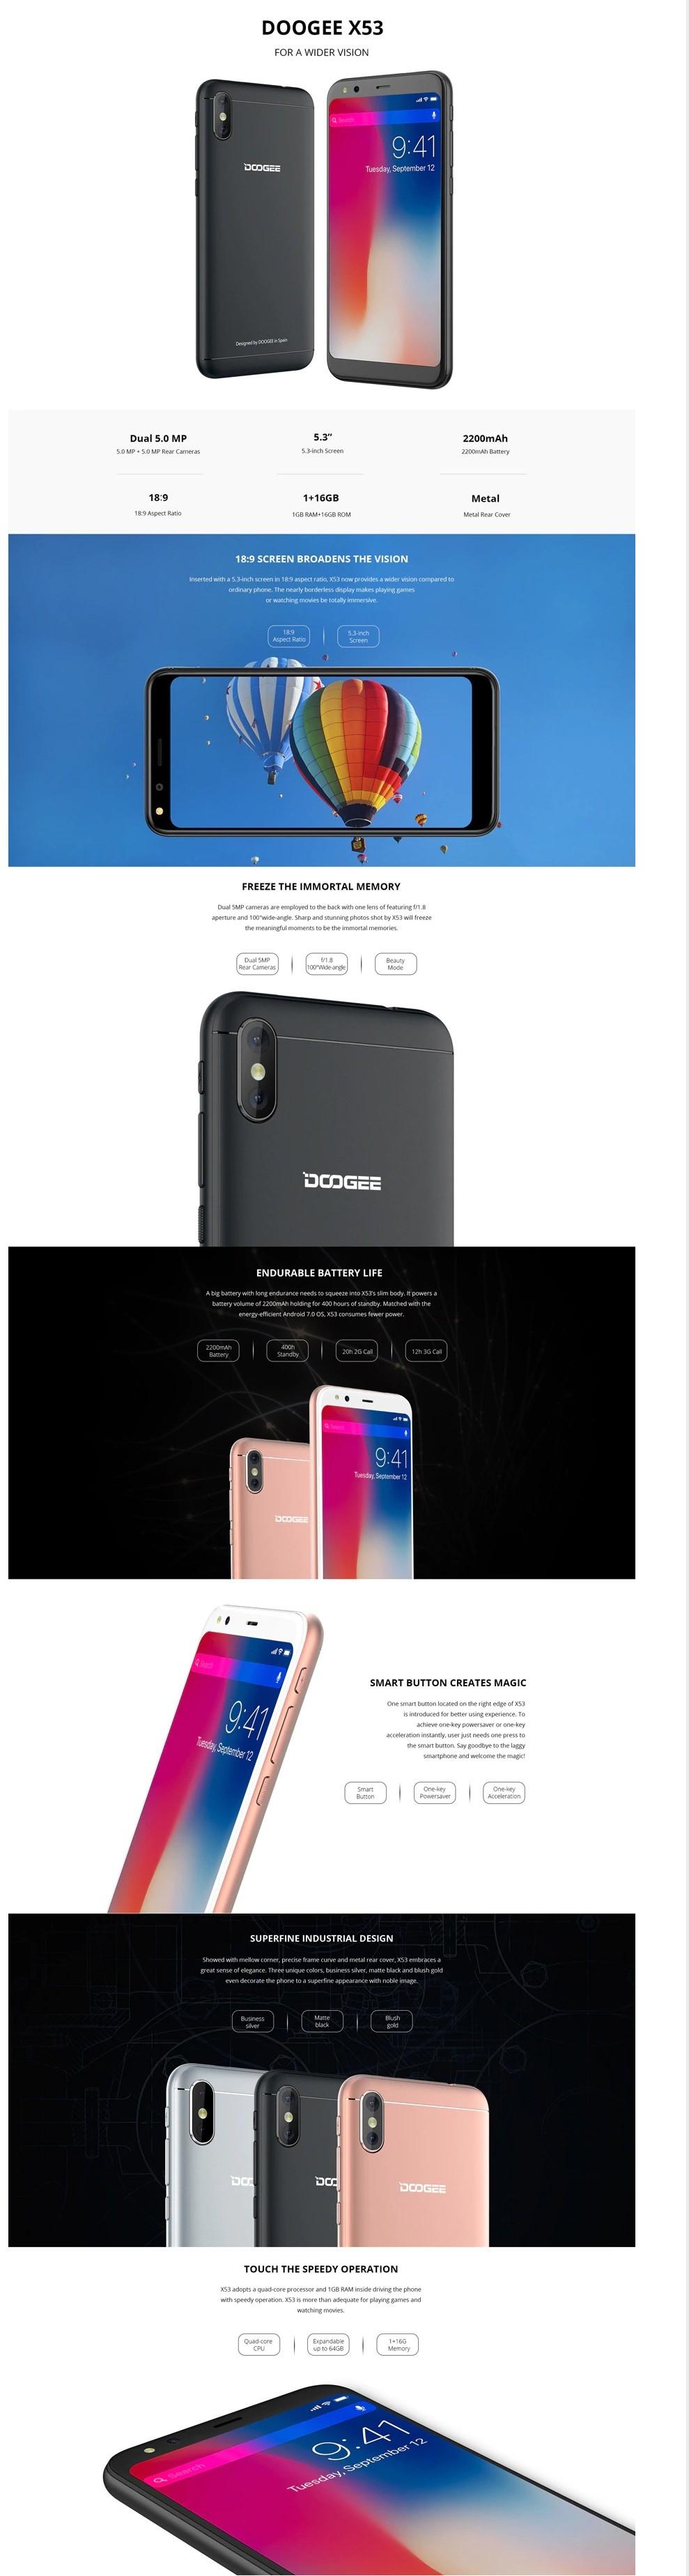 prezentare-doogee-x5341f486b34a06eab9.jpg